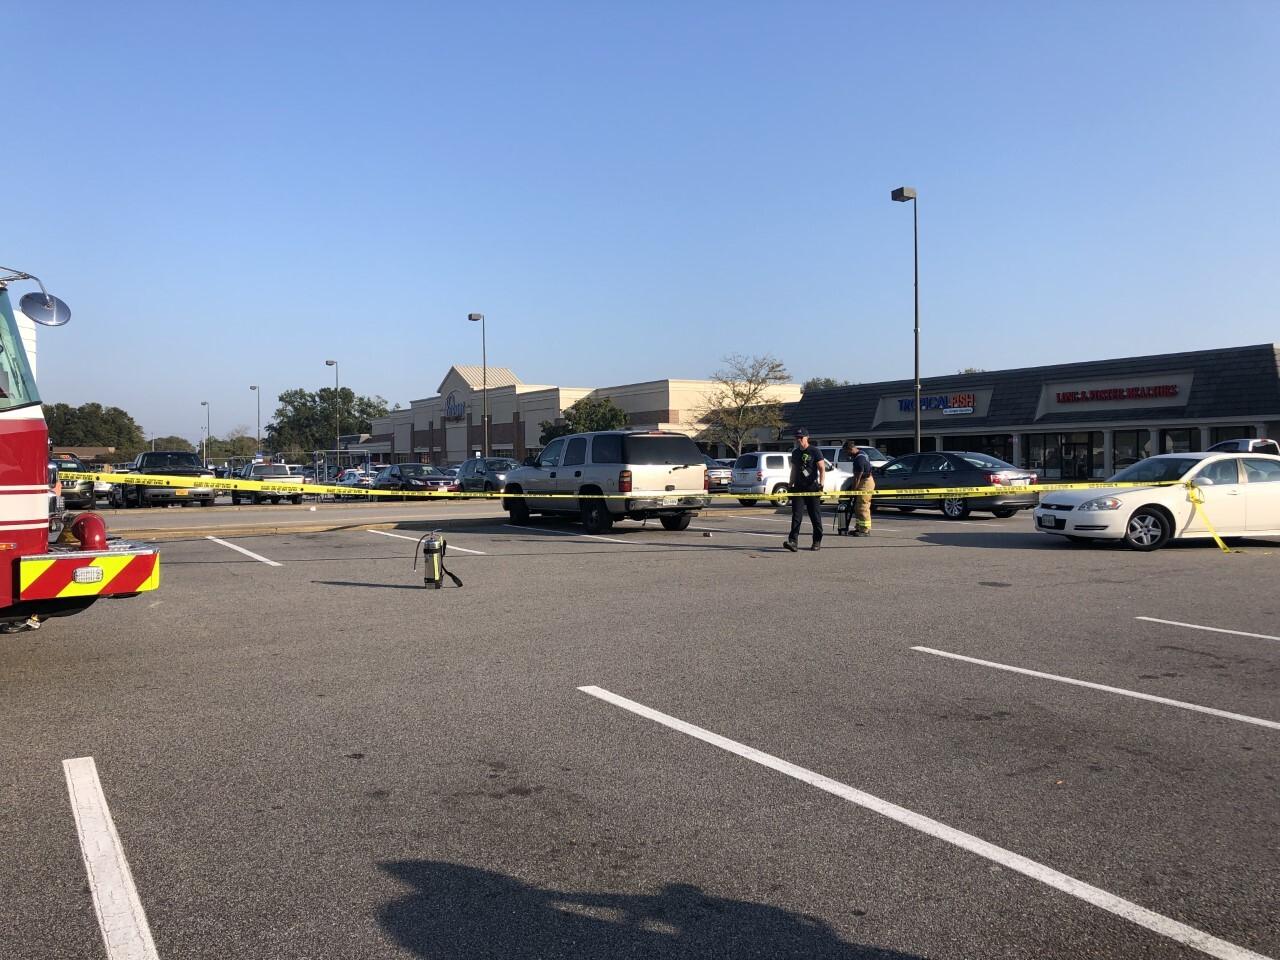 Photos: Person found dead inside vehicle at Virginia Beach shopping center; investigationunderway